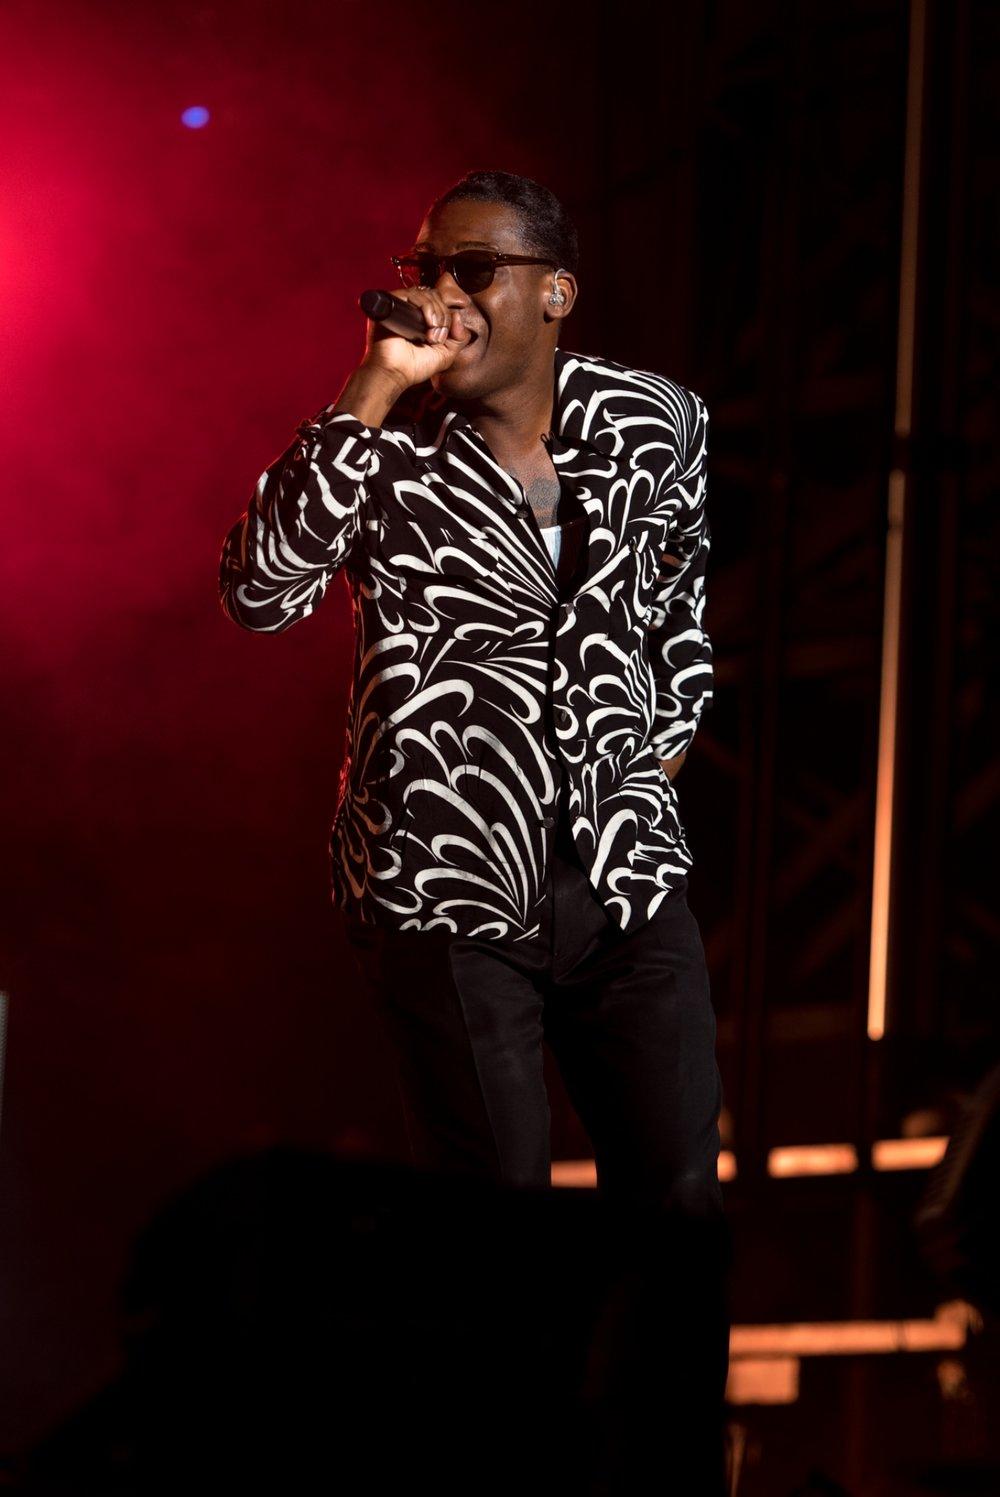 Leon Bridges singing with ODESZA headlining at Bumbershoot Music Festival at Seattle Center Washington 2017